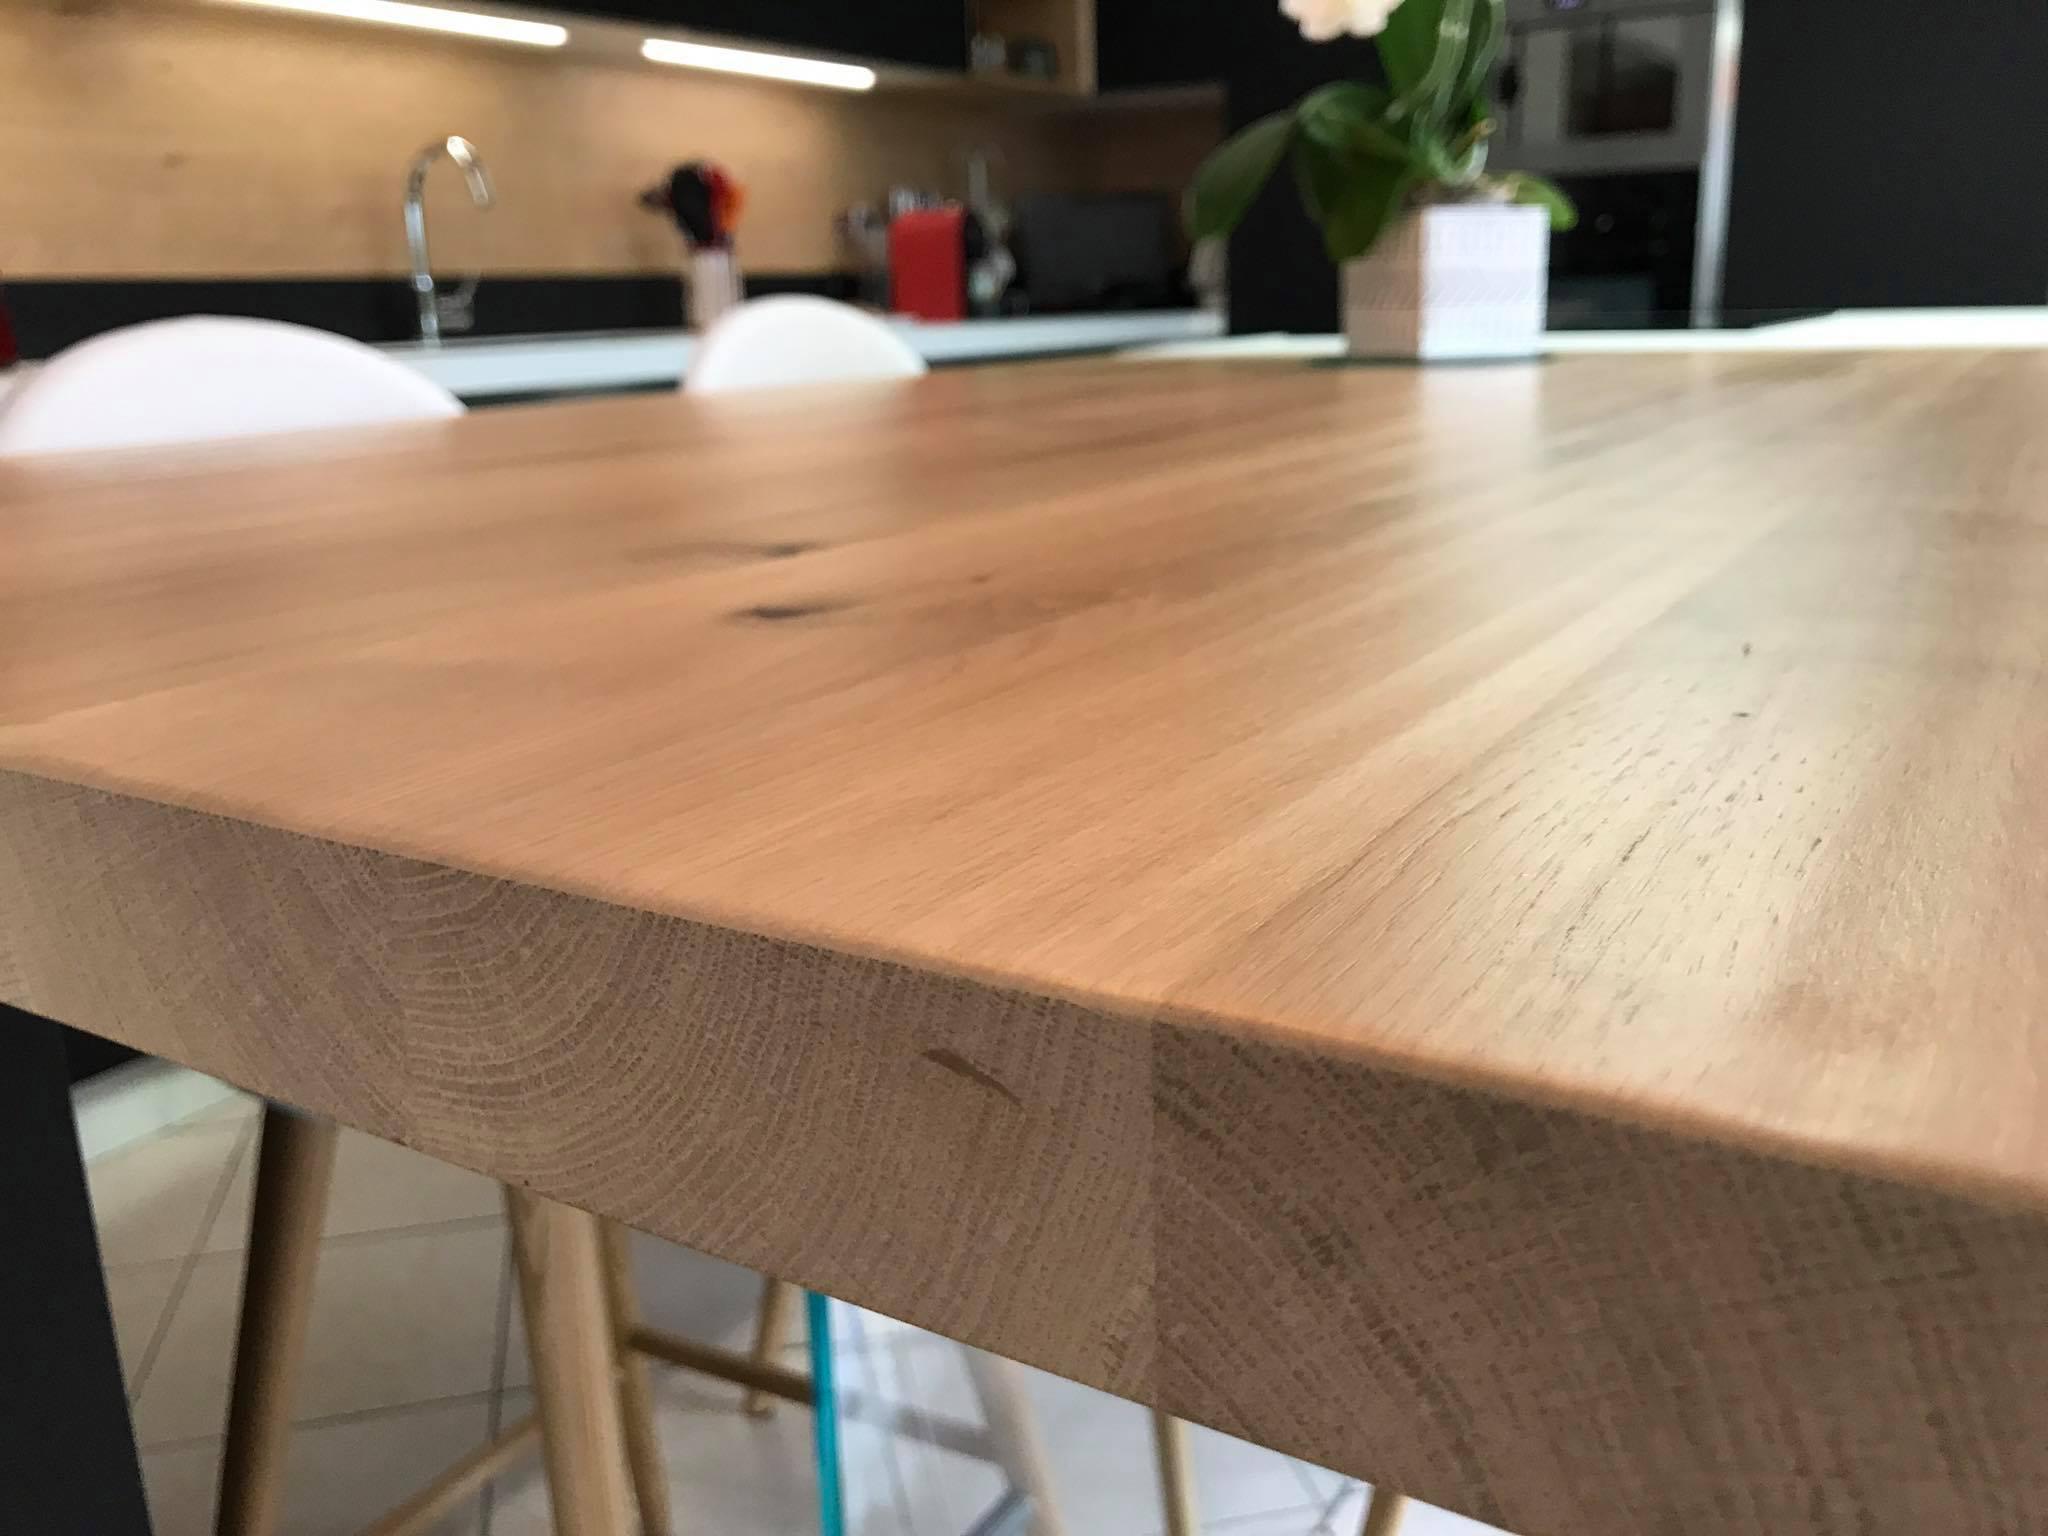 Finition de la table en chêne massif